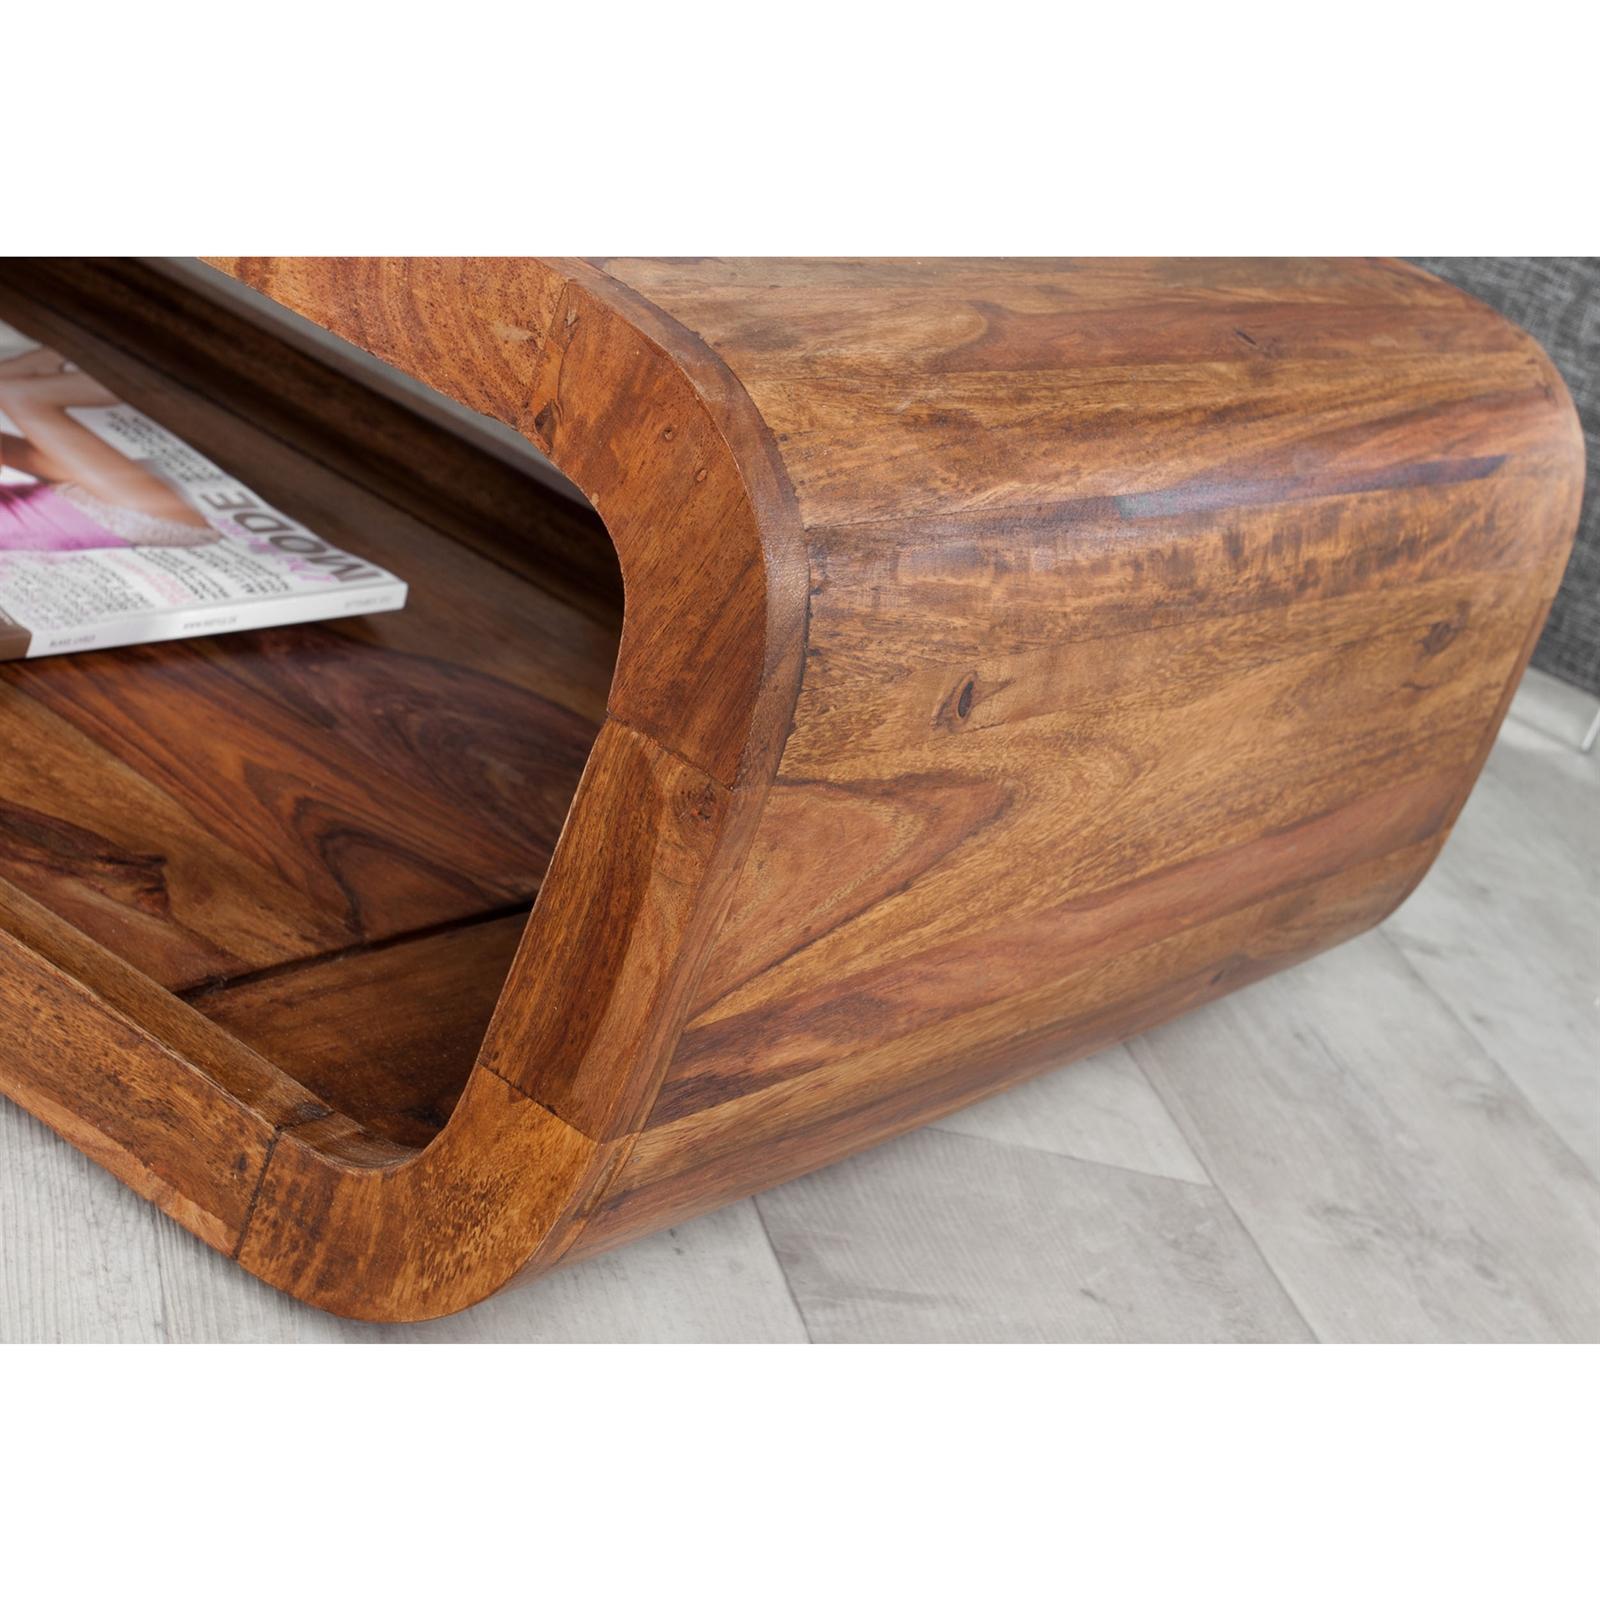 couchtisch friedrich 120 cm sheesham massiv tv tisch eur 304 00 picclick de. Black Bedroom Furniture Sets. Home Design Ideas